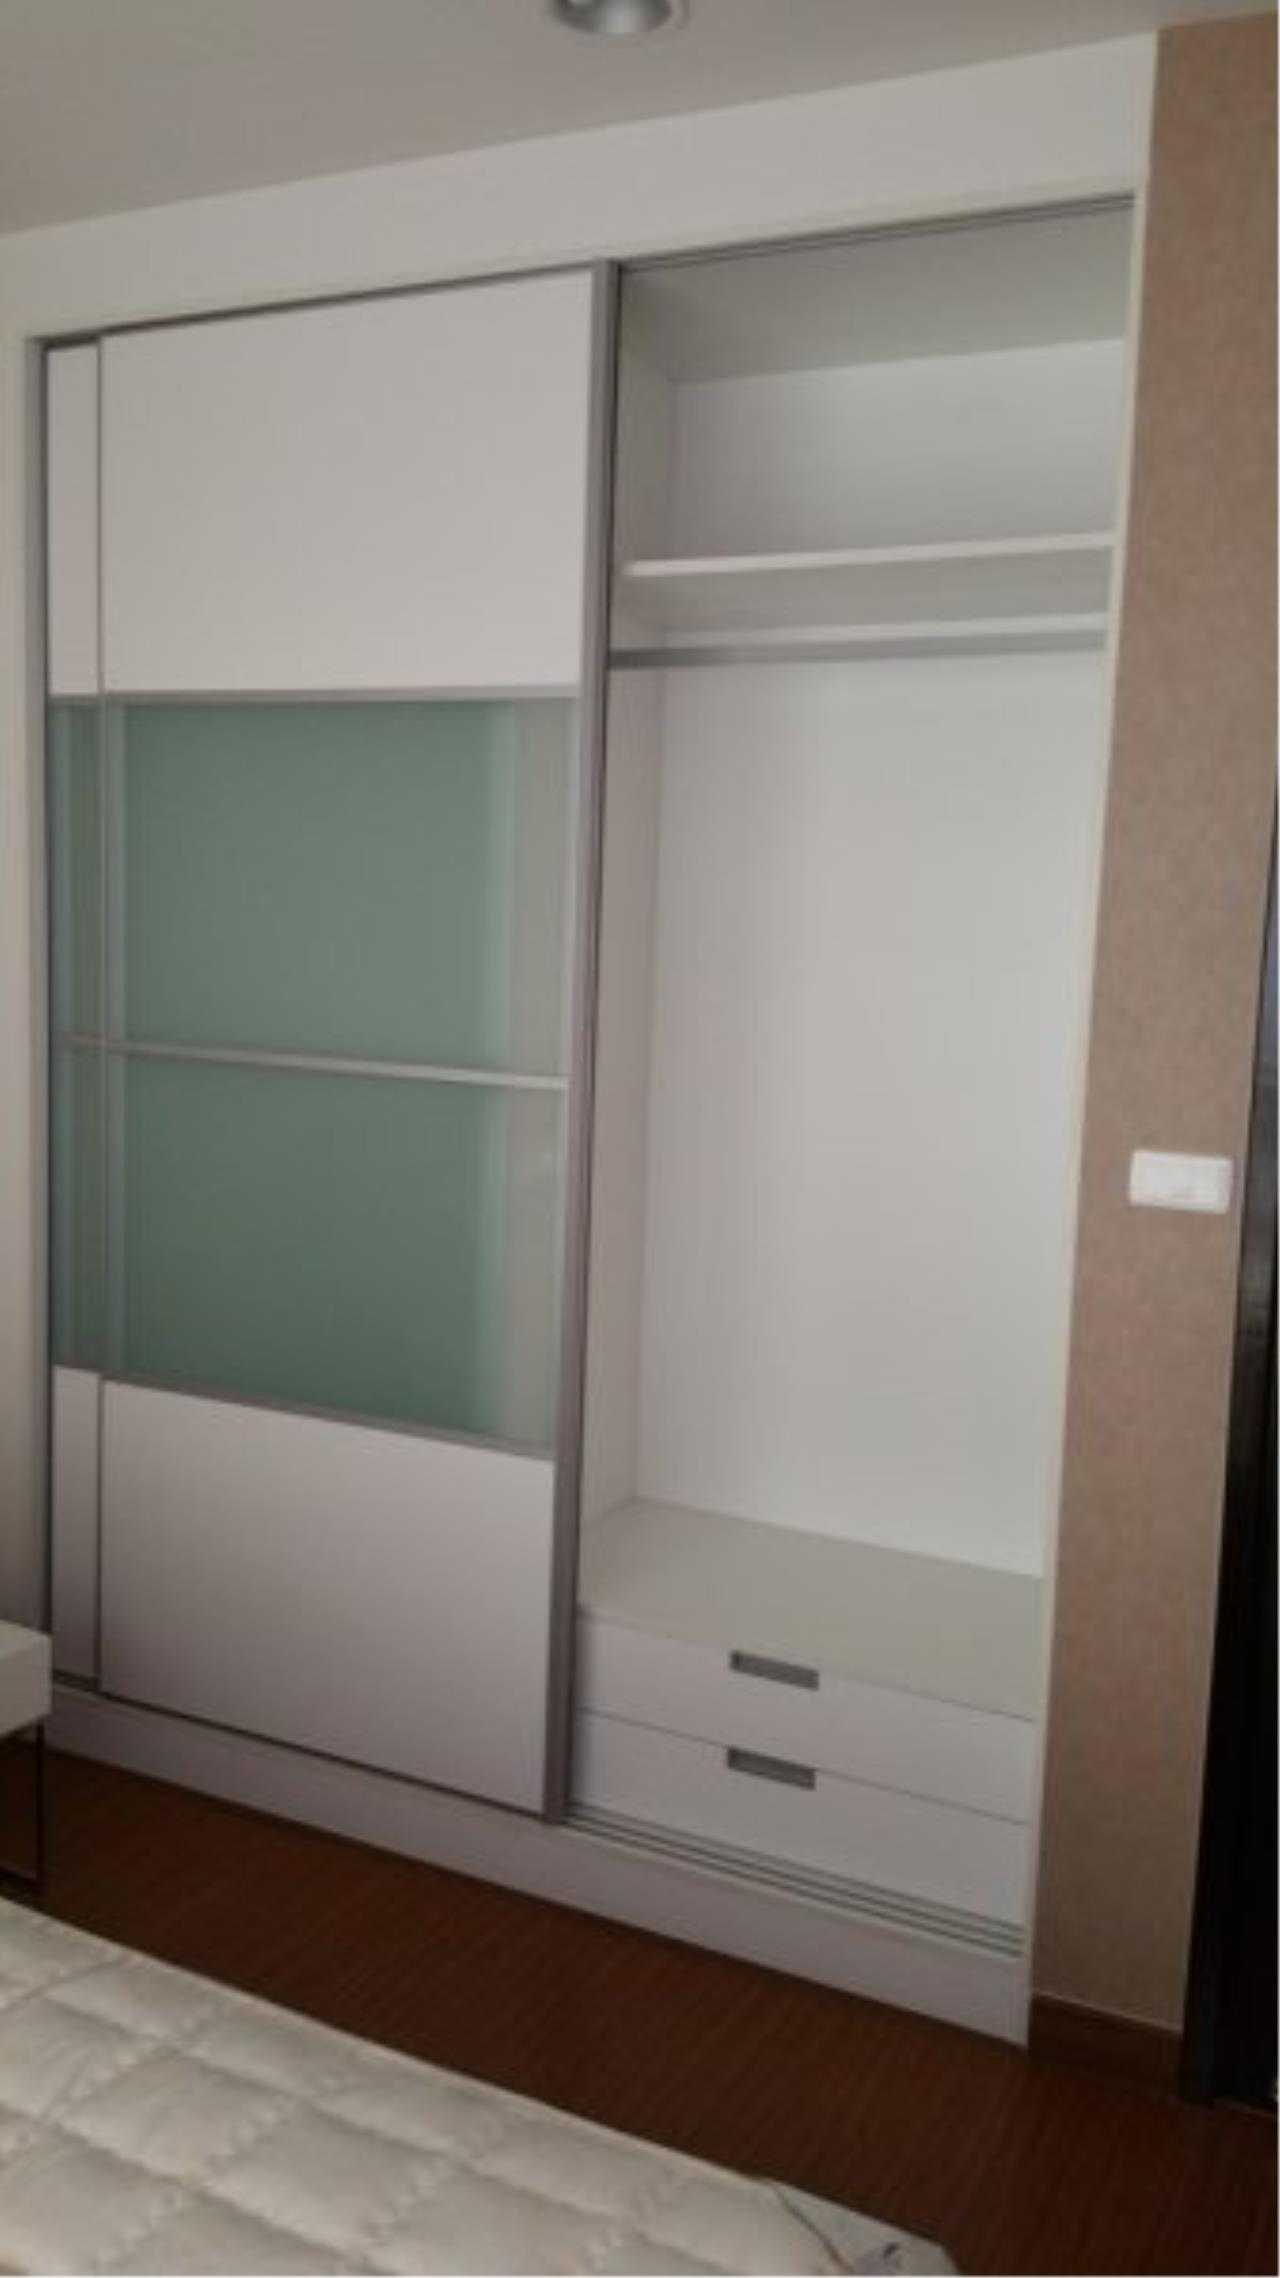 Piri Property Agency's Cozy 1 Bedroom in the Diamond Sukhumvit Condo for sale on high floor 3